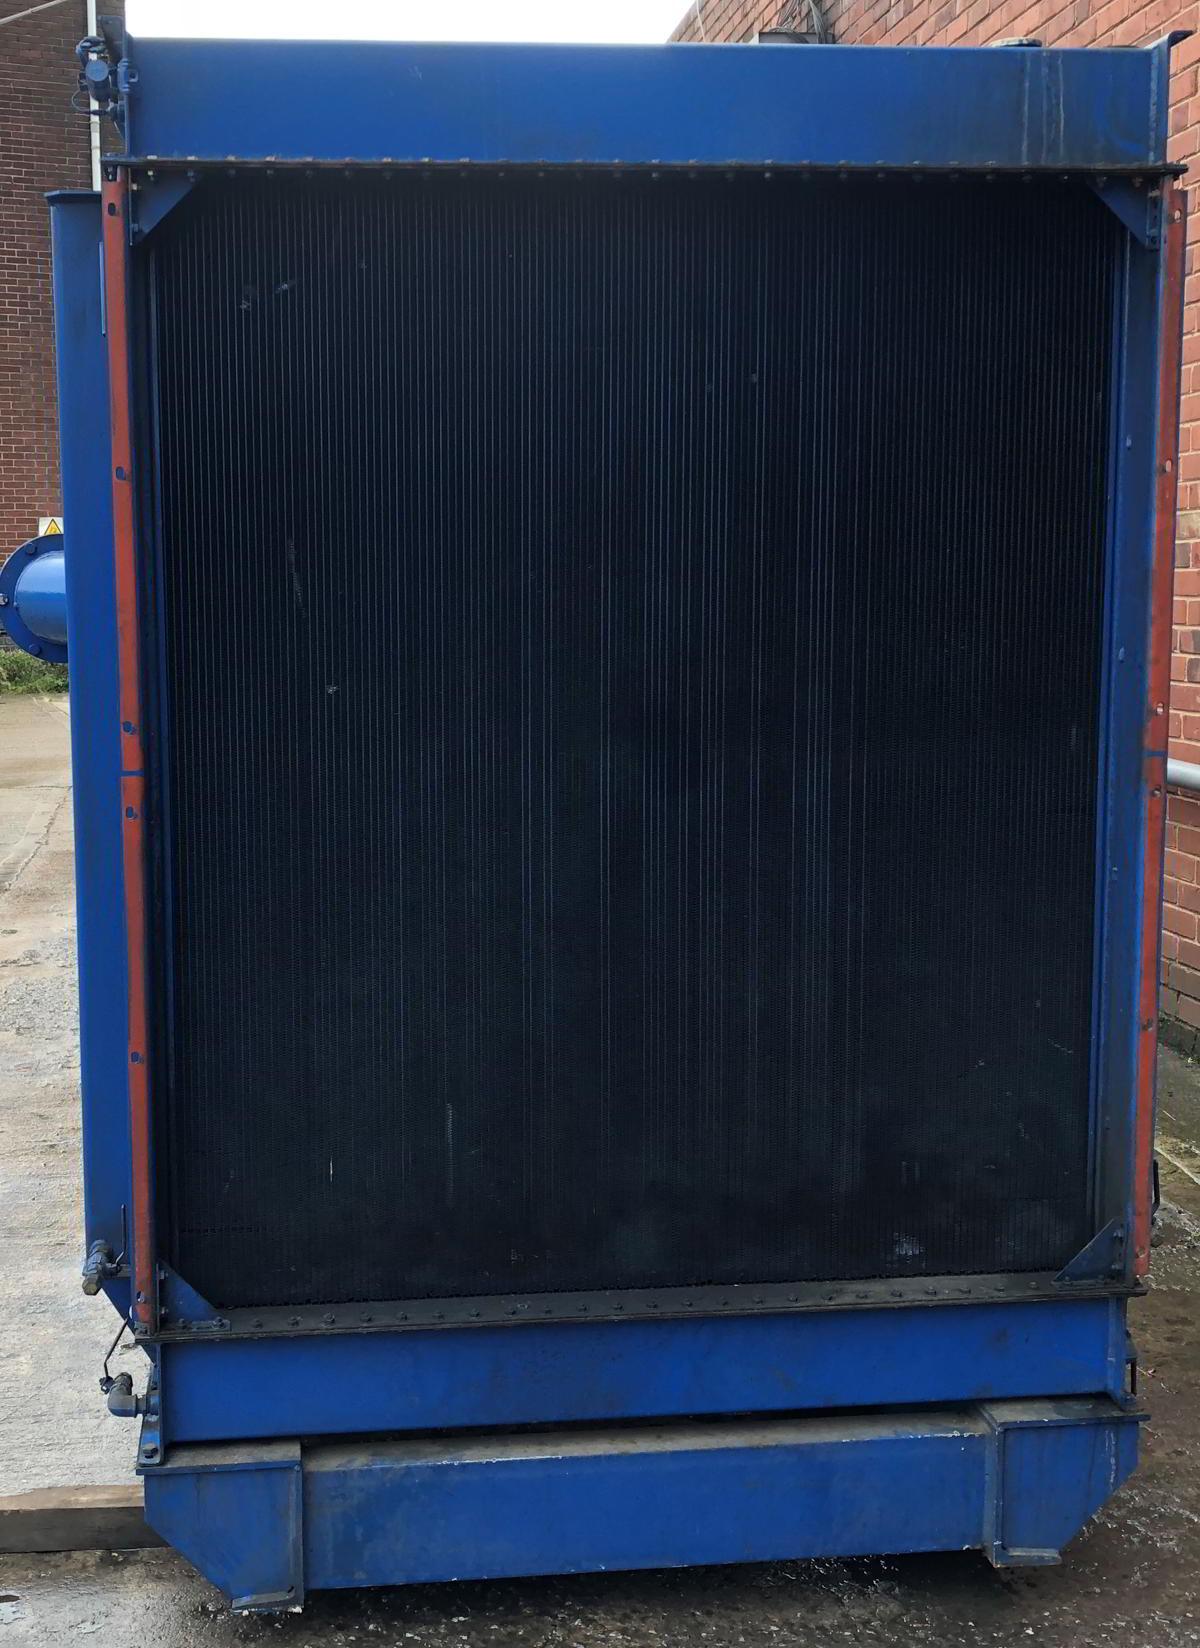 936 Kva Perkins Stamford Open Type Generator 5